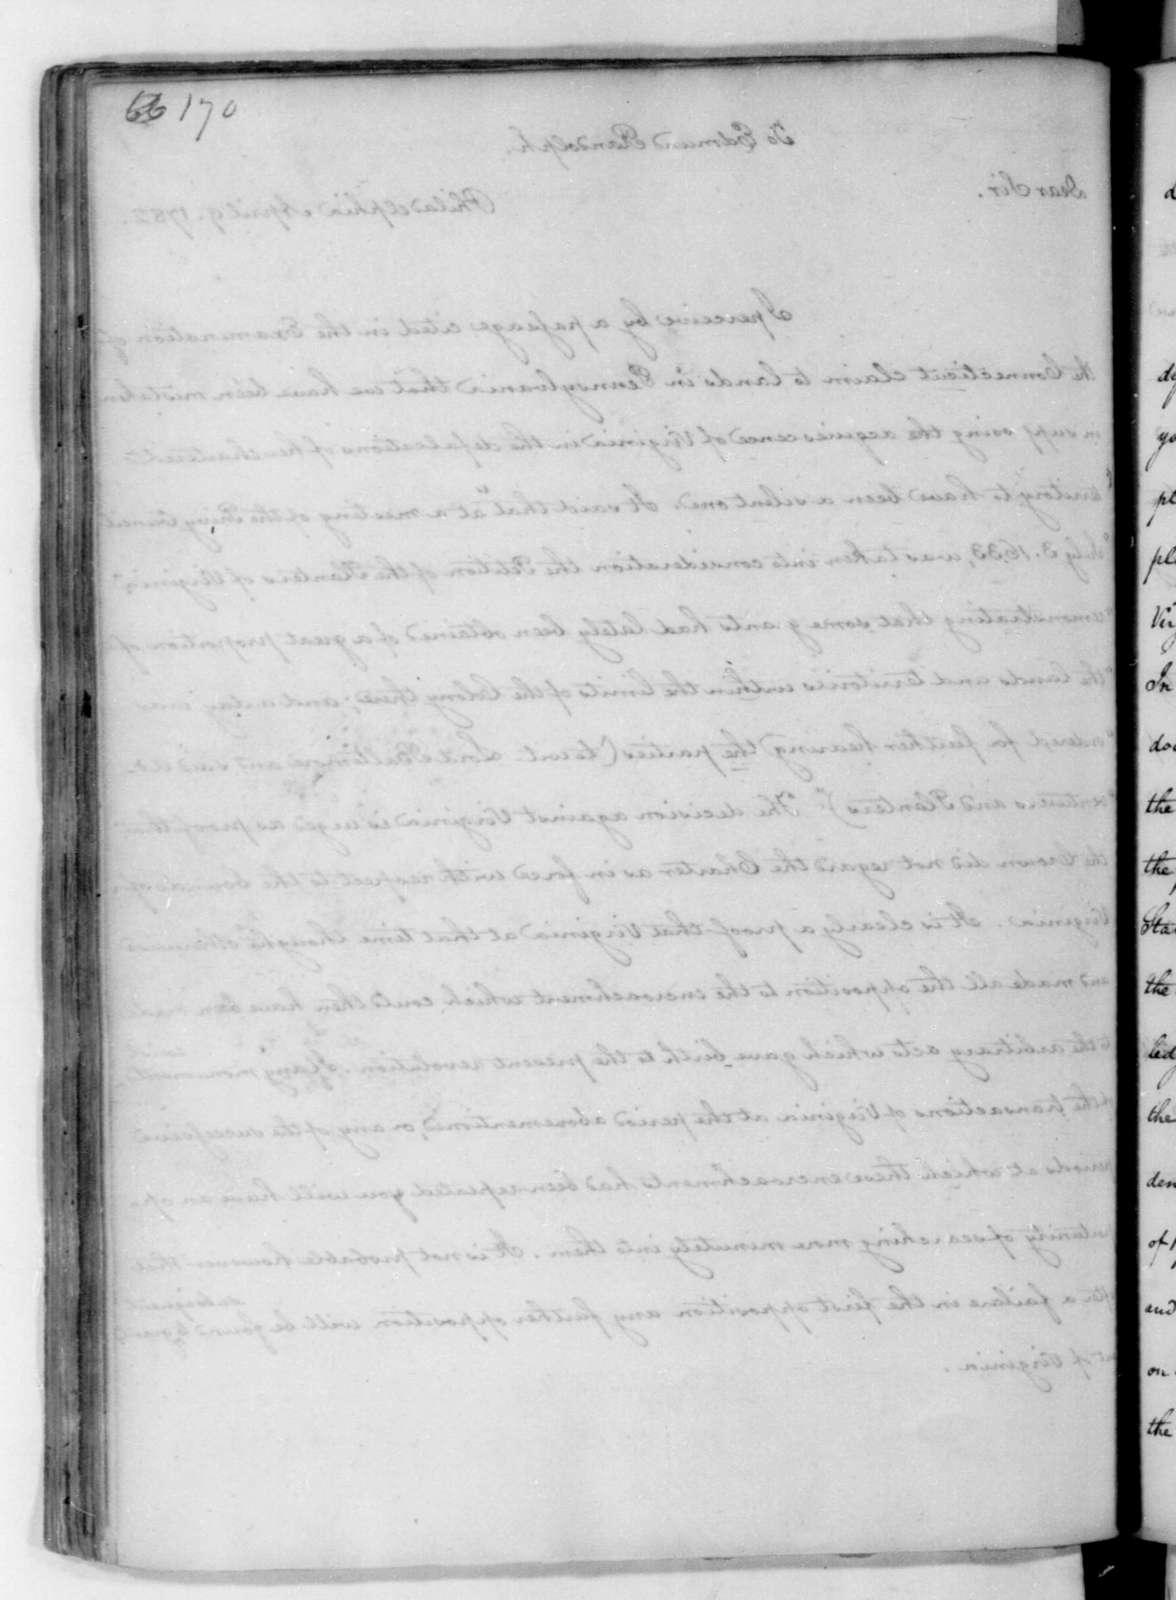 James Madison to Edmund Randolph, April 9, 1782.